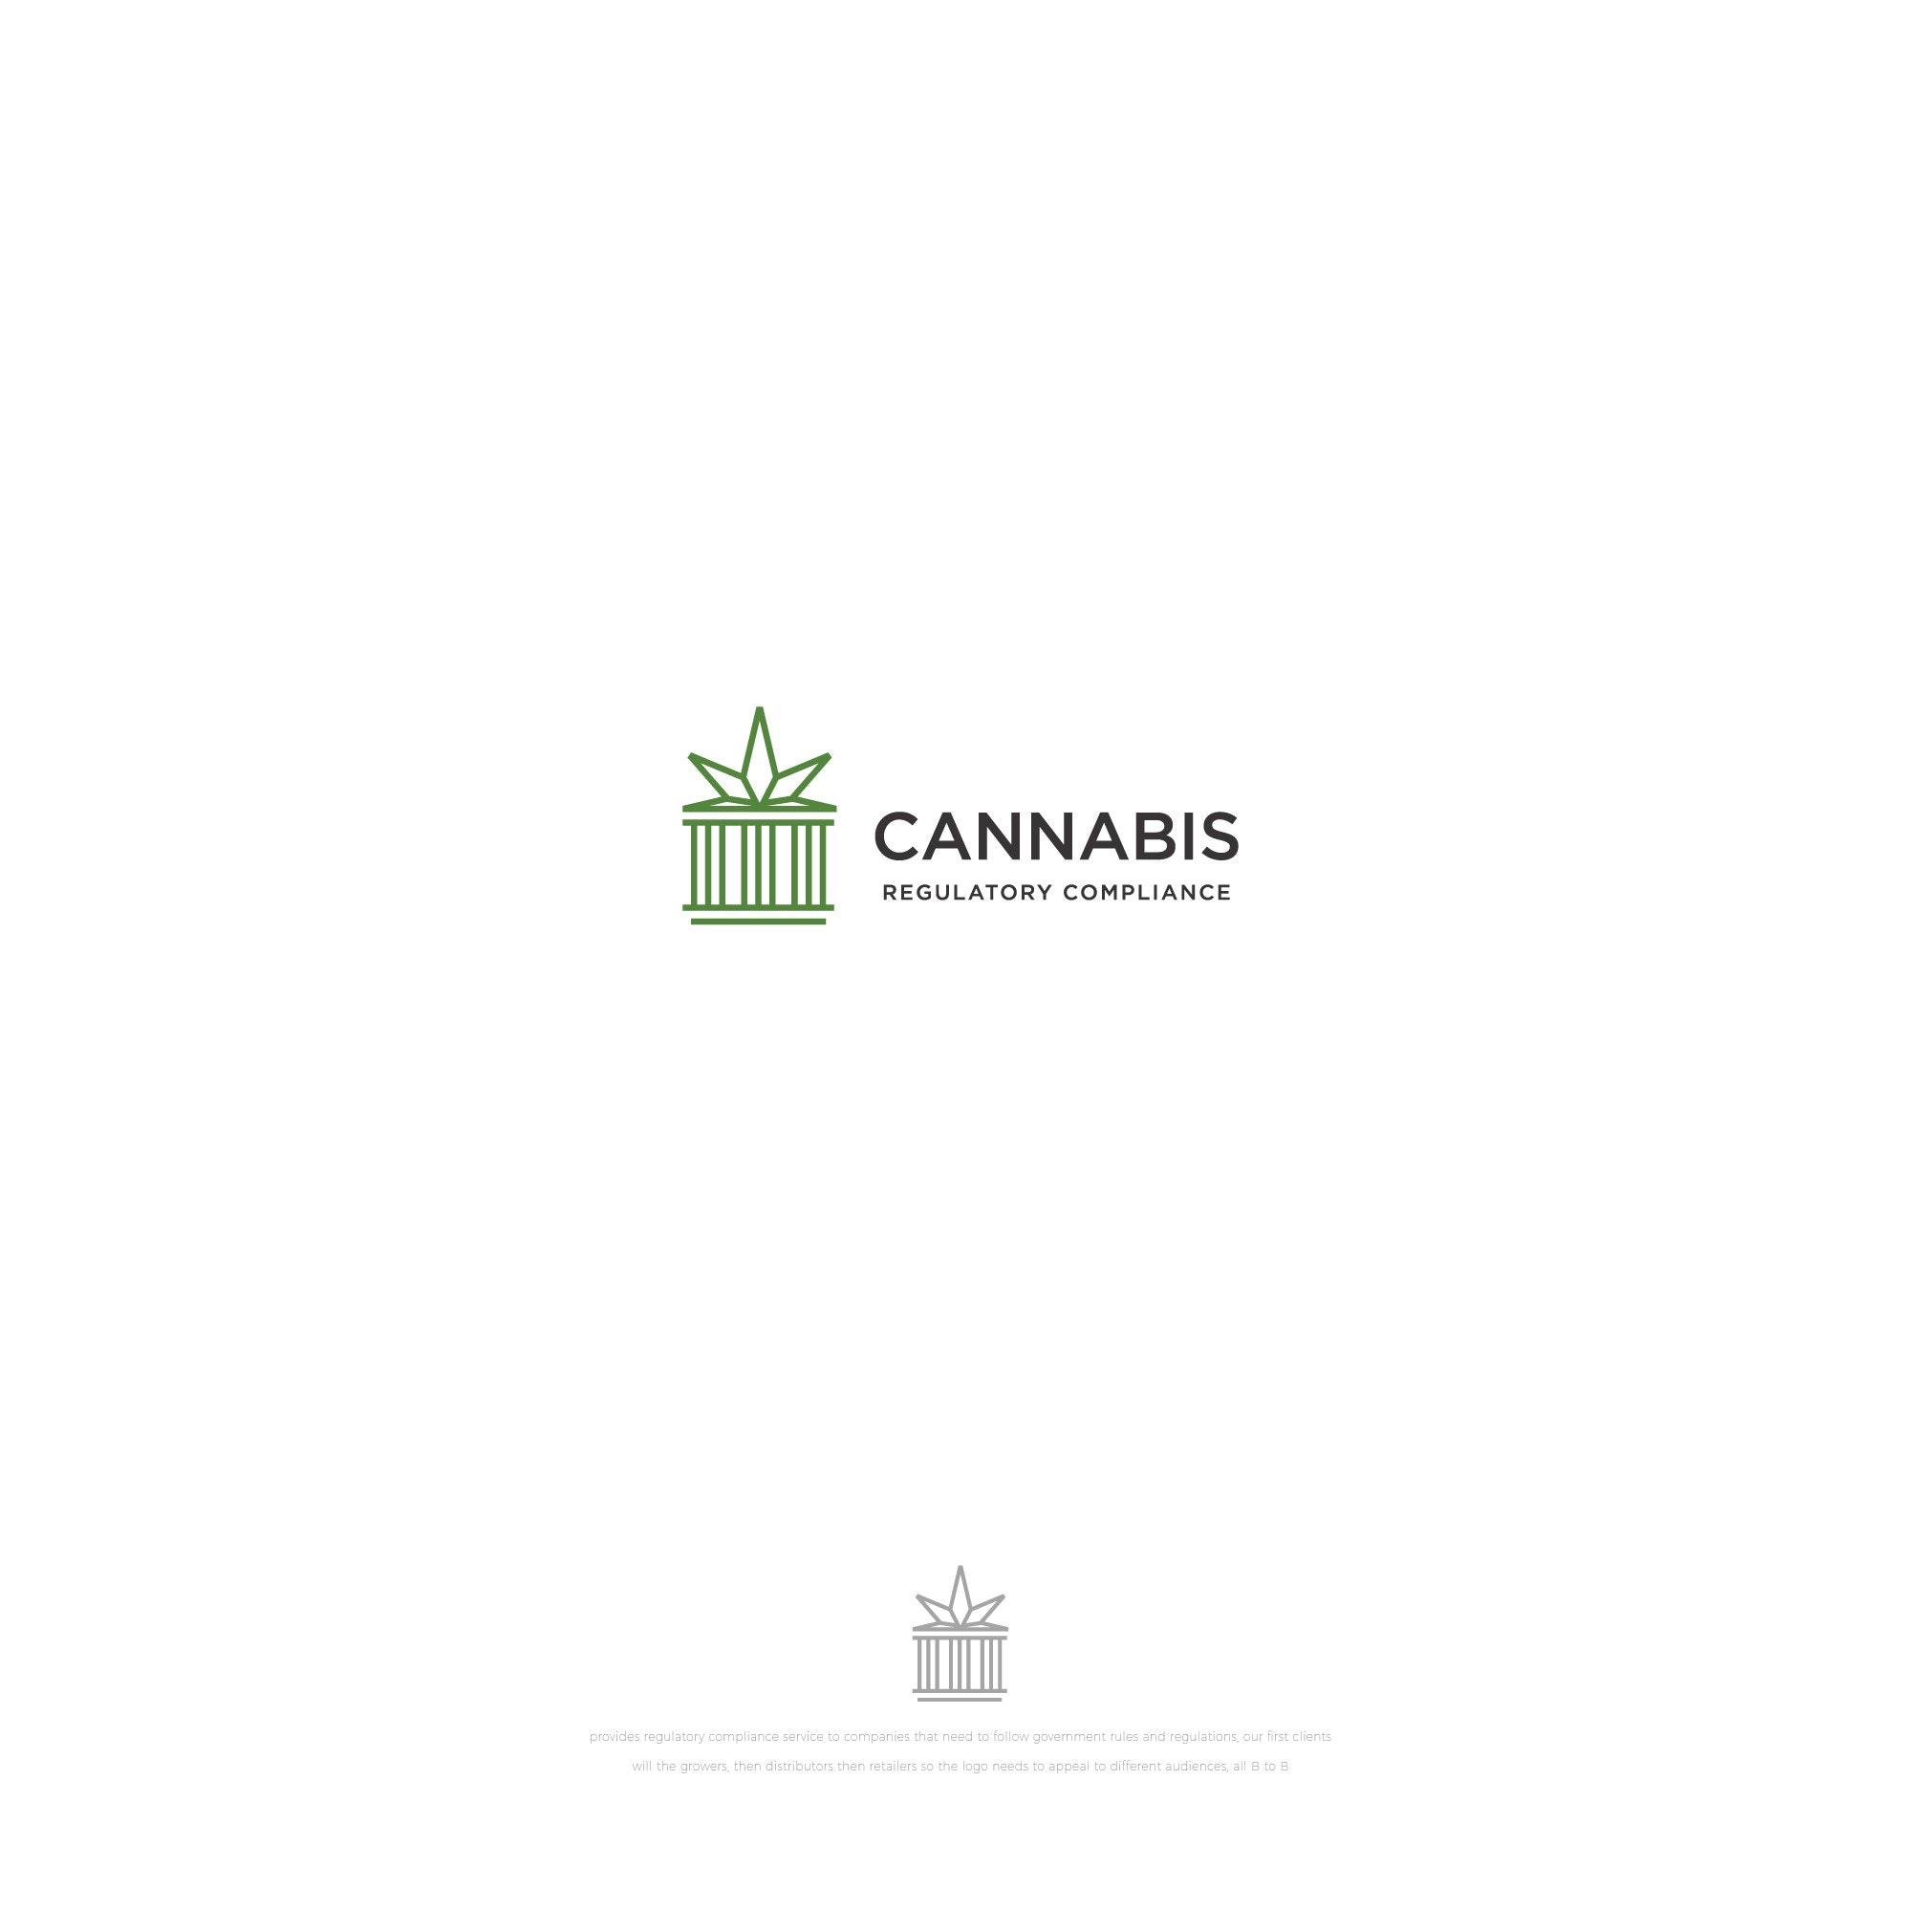 Cannabis Regulatory Compliance logo